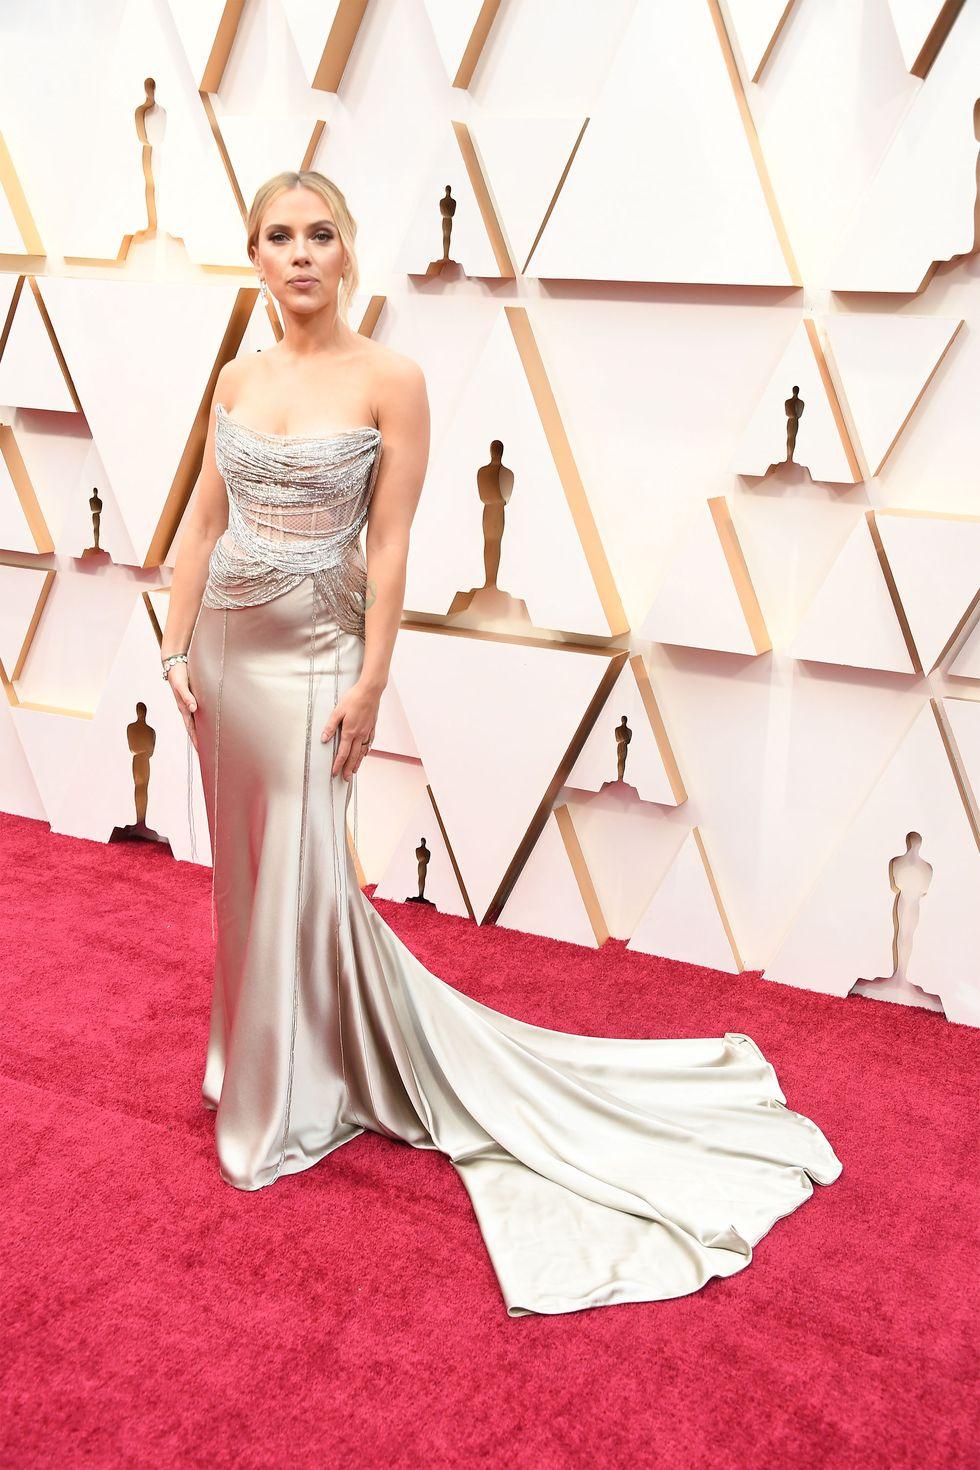 Scarlett Johansson updo χτενισμα ολοσωμη